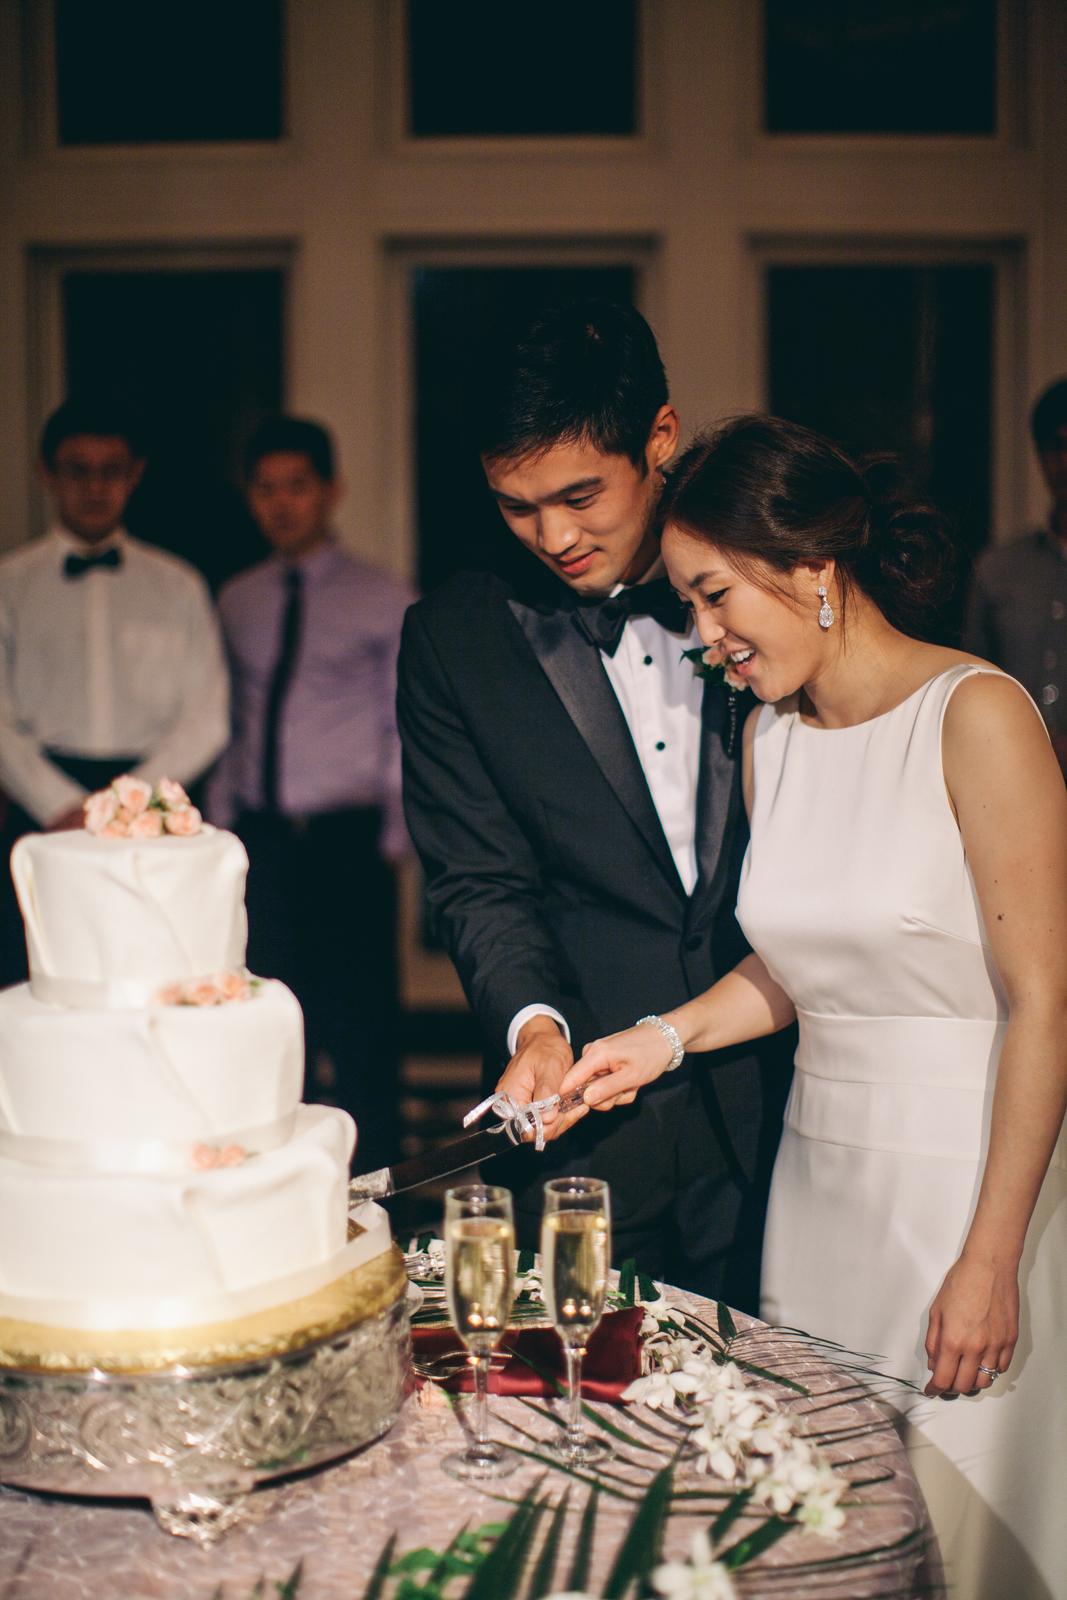 kohl_manison_wedding_photography_sarah_eric_ebony_siovhan_bokeh_photography_098.jpg